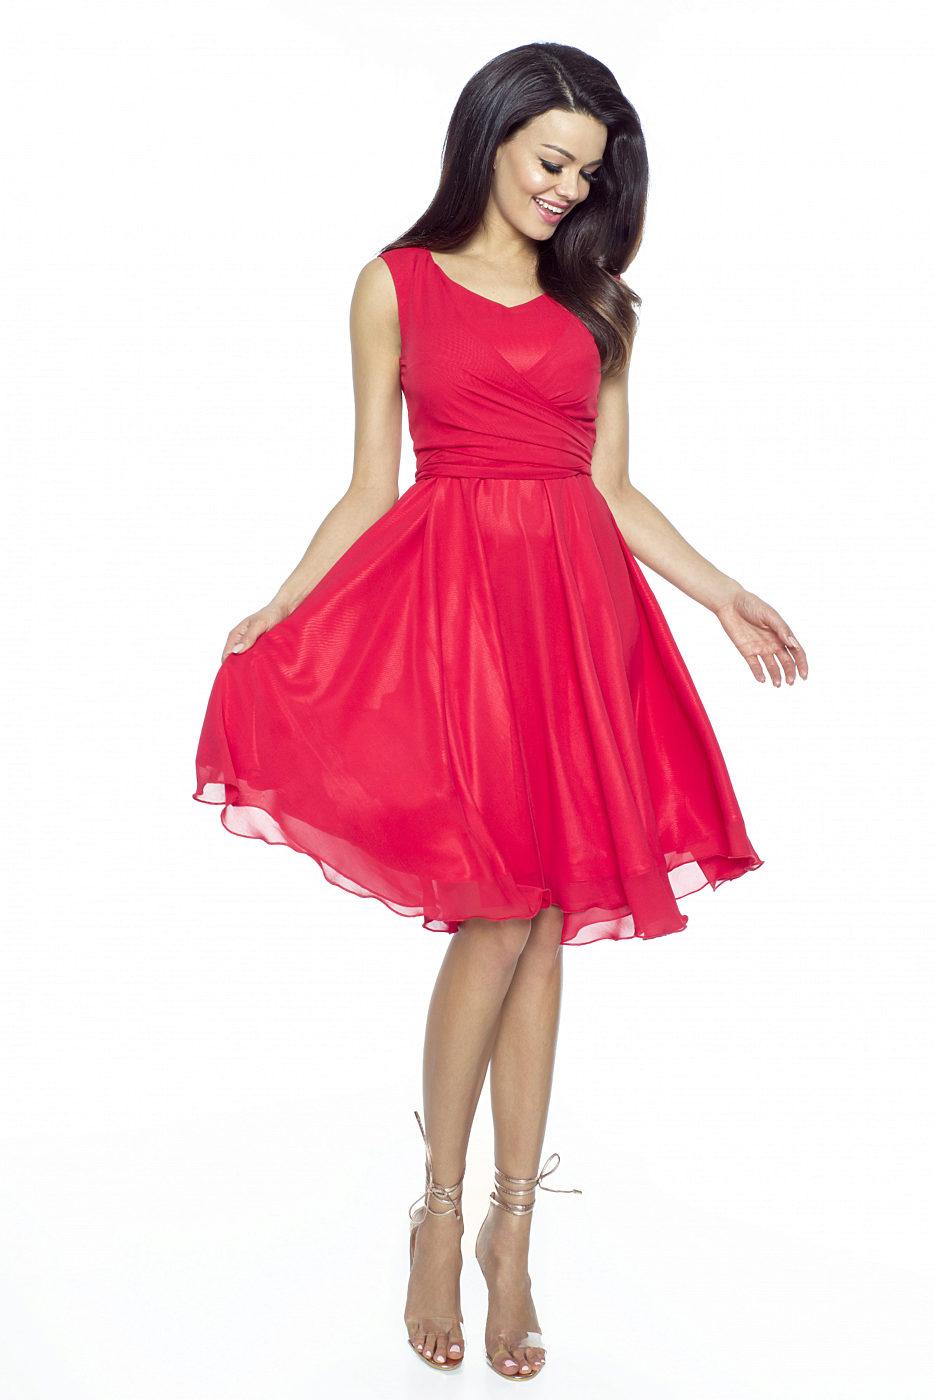 d7954194f25 Červené šaty Kartes Paola Kartes